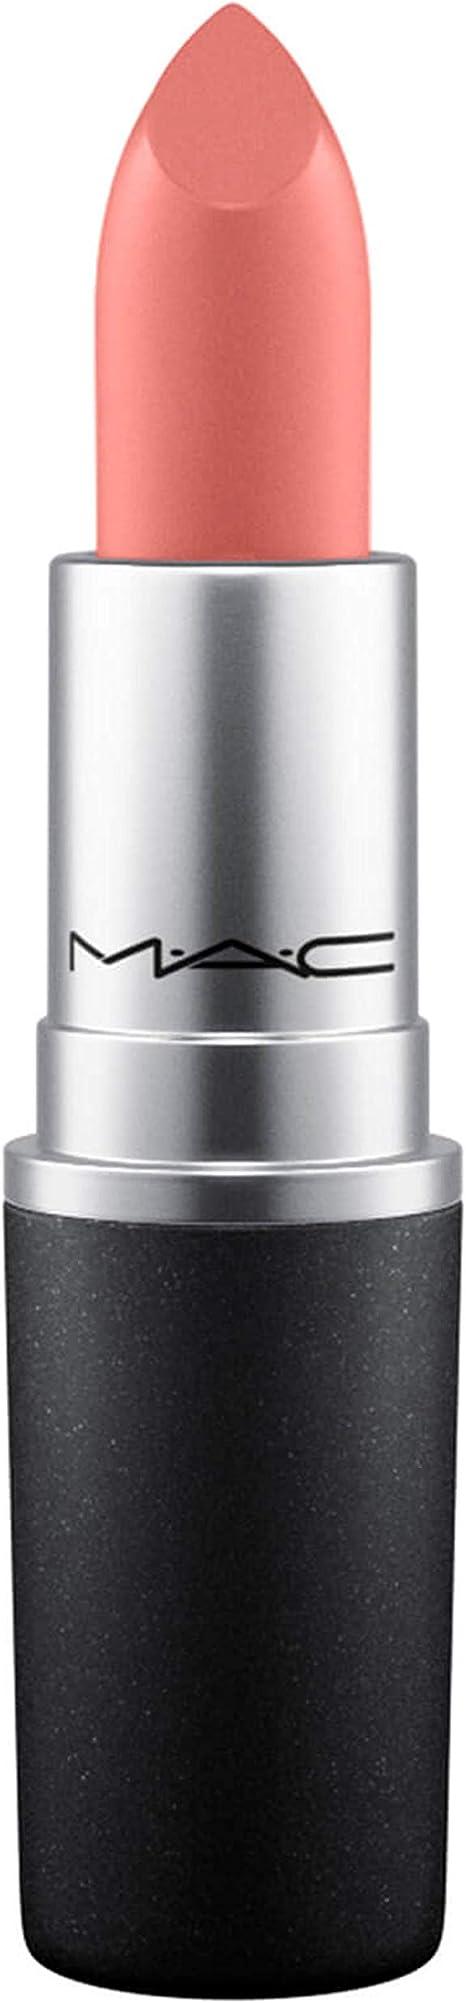 MAC Frost Lipstick Meltdown: Amazon.co